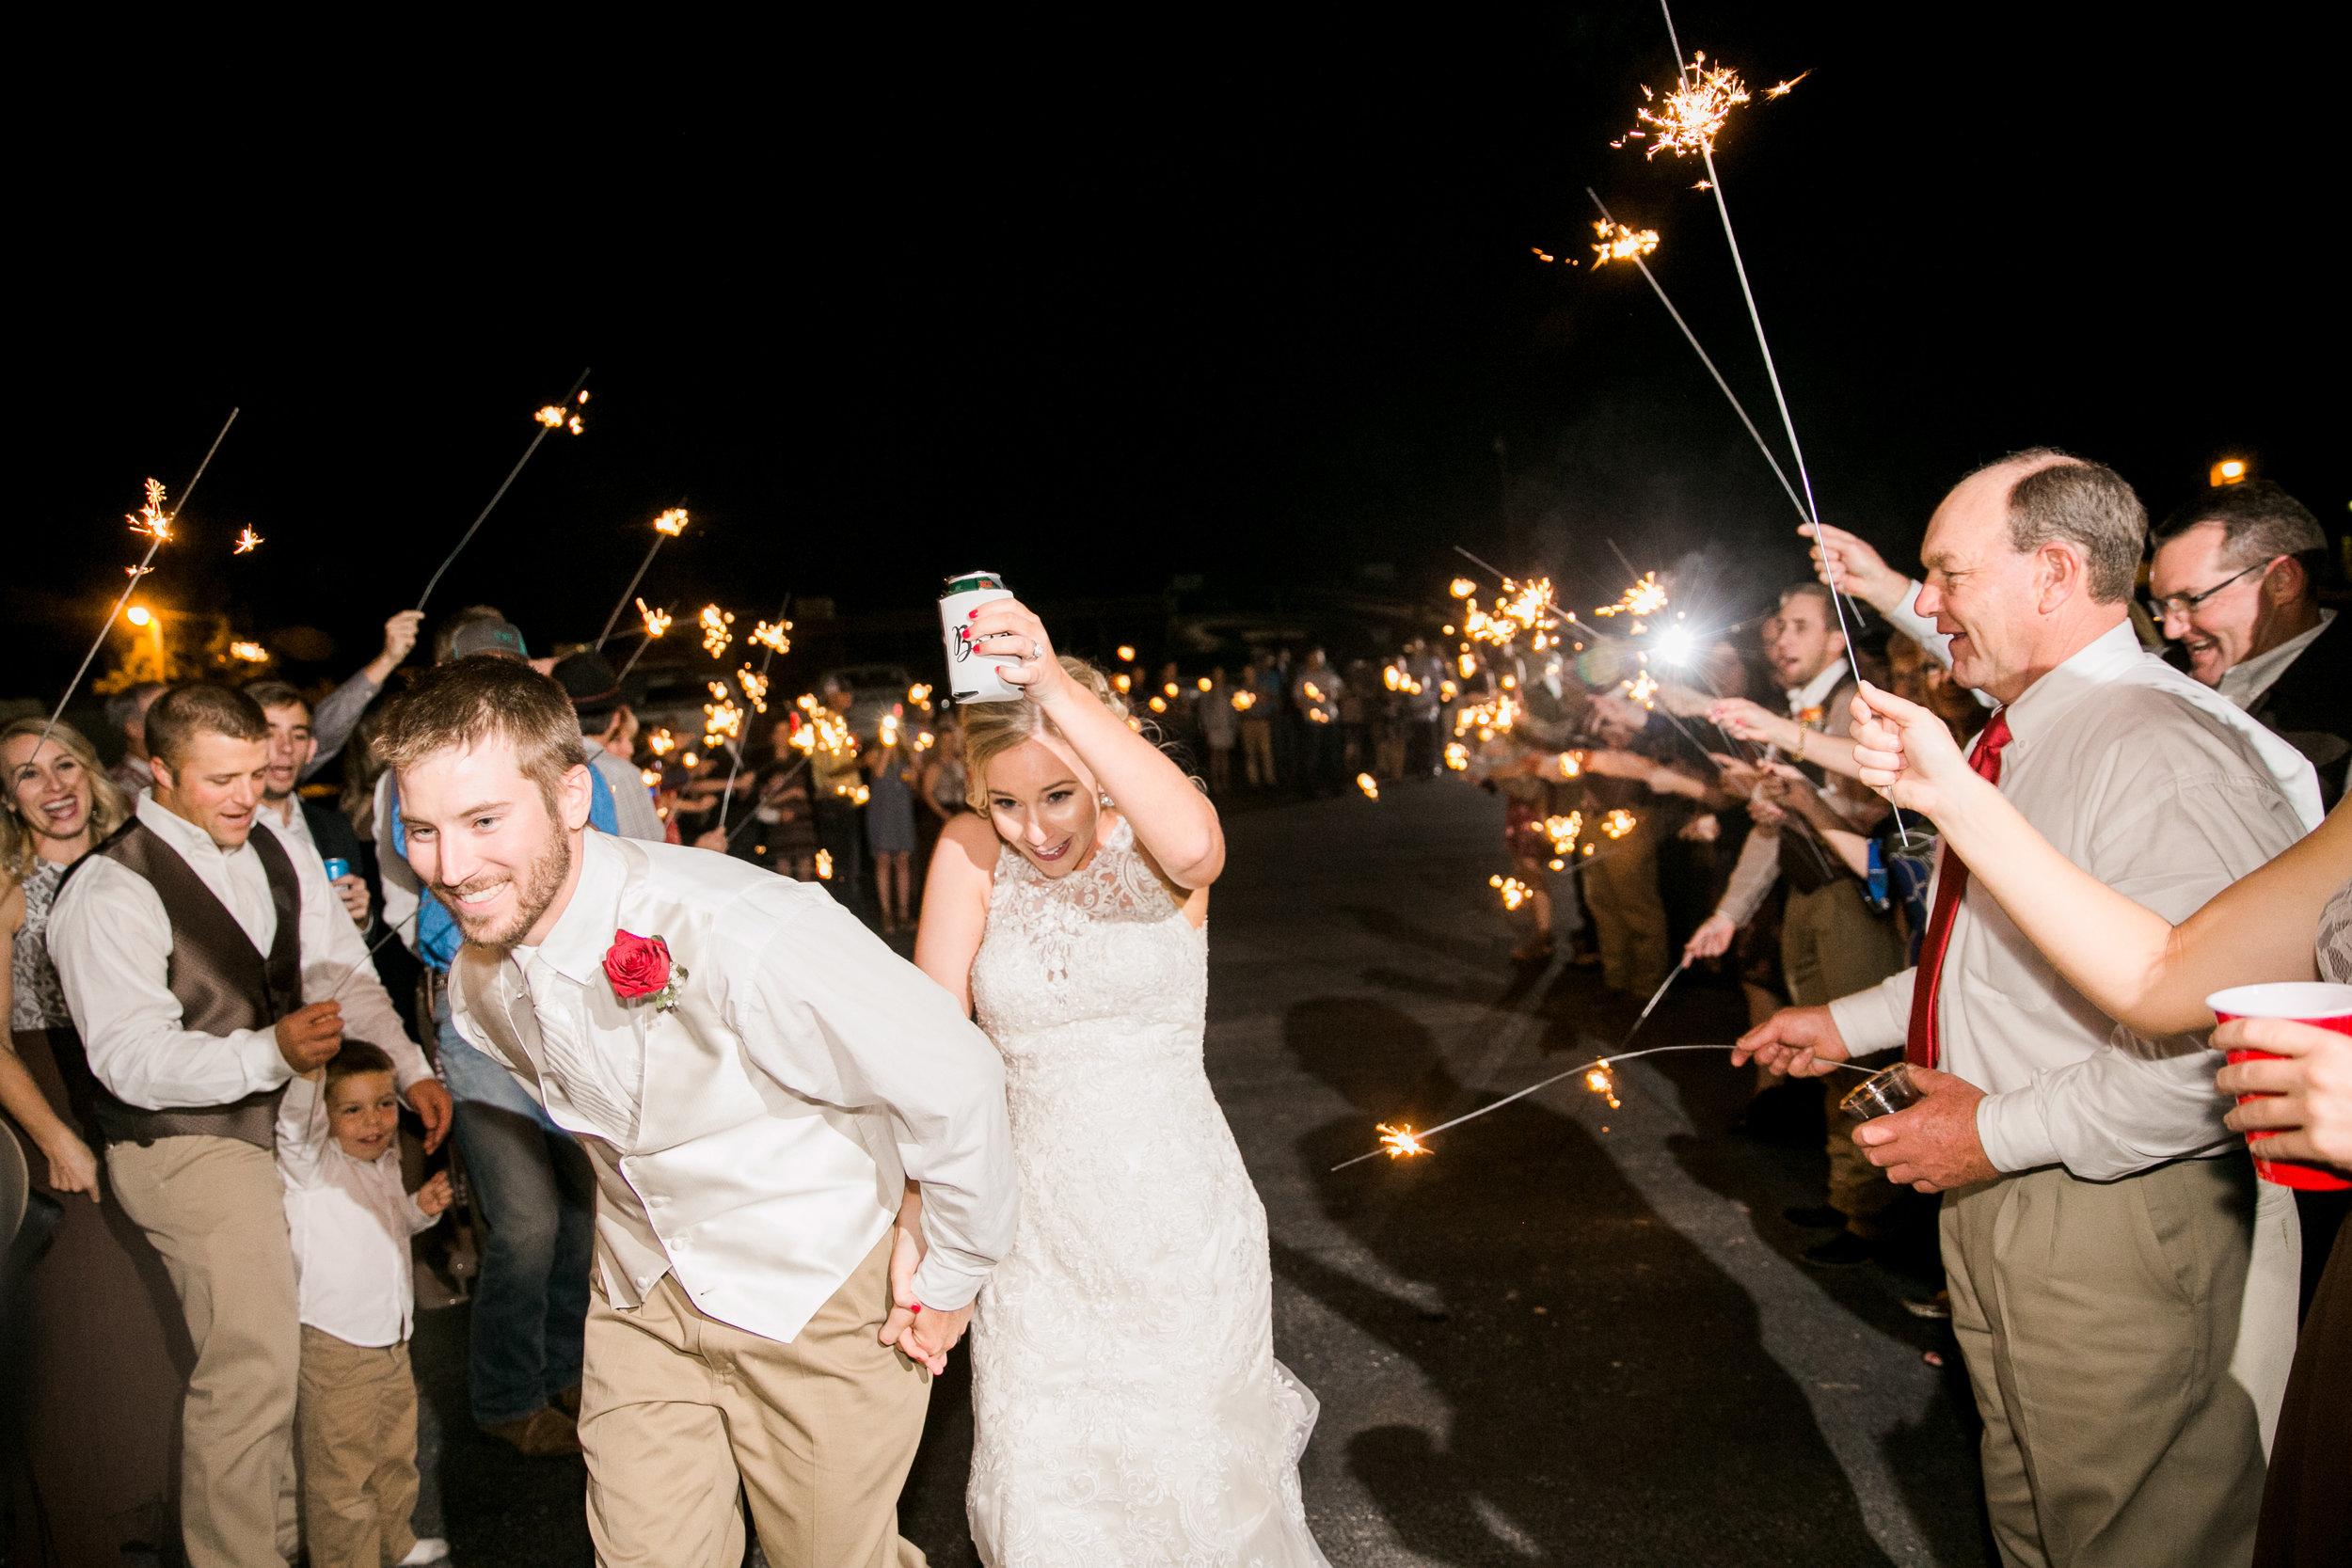 Bailey-Nathan-Windthorst-Texas-Wedding-069.jpg